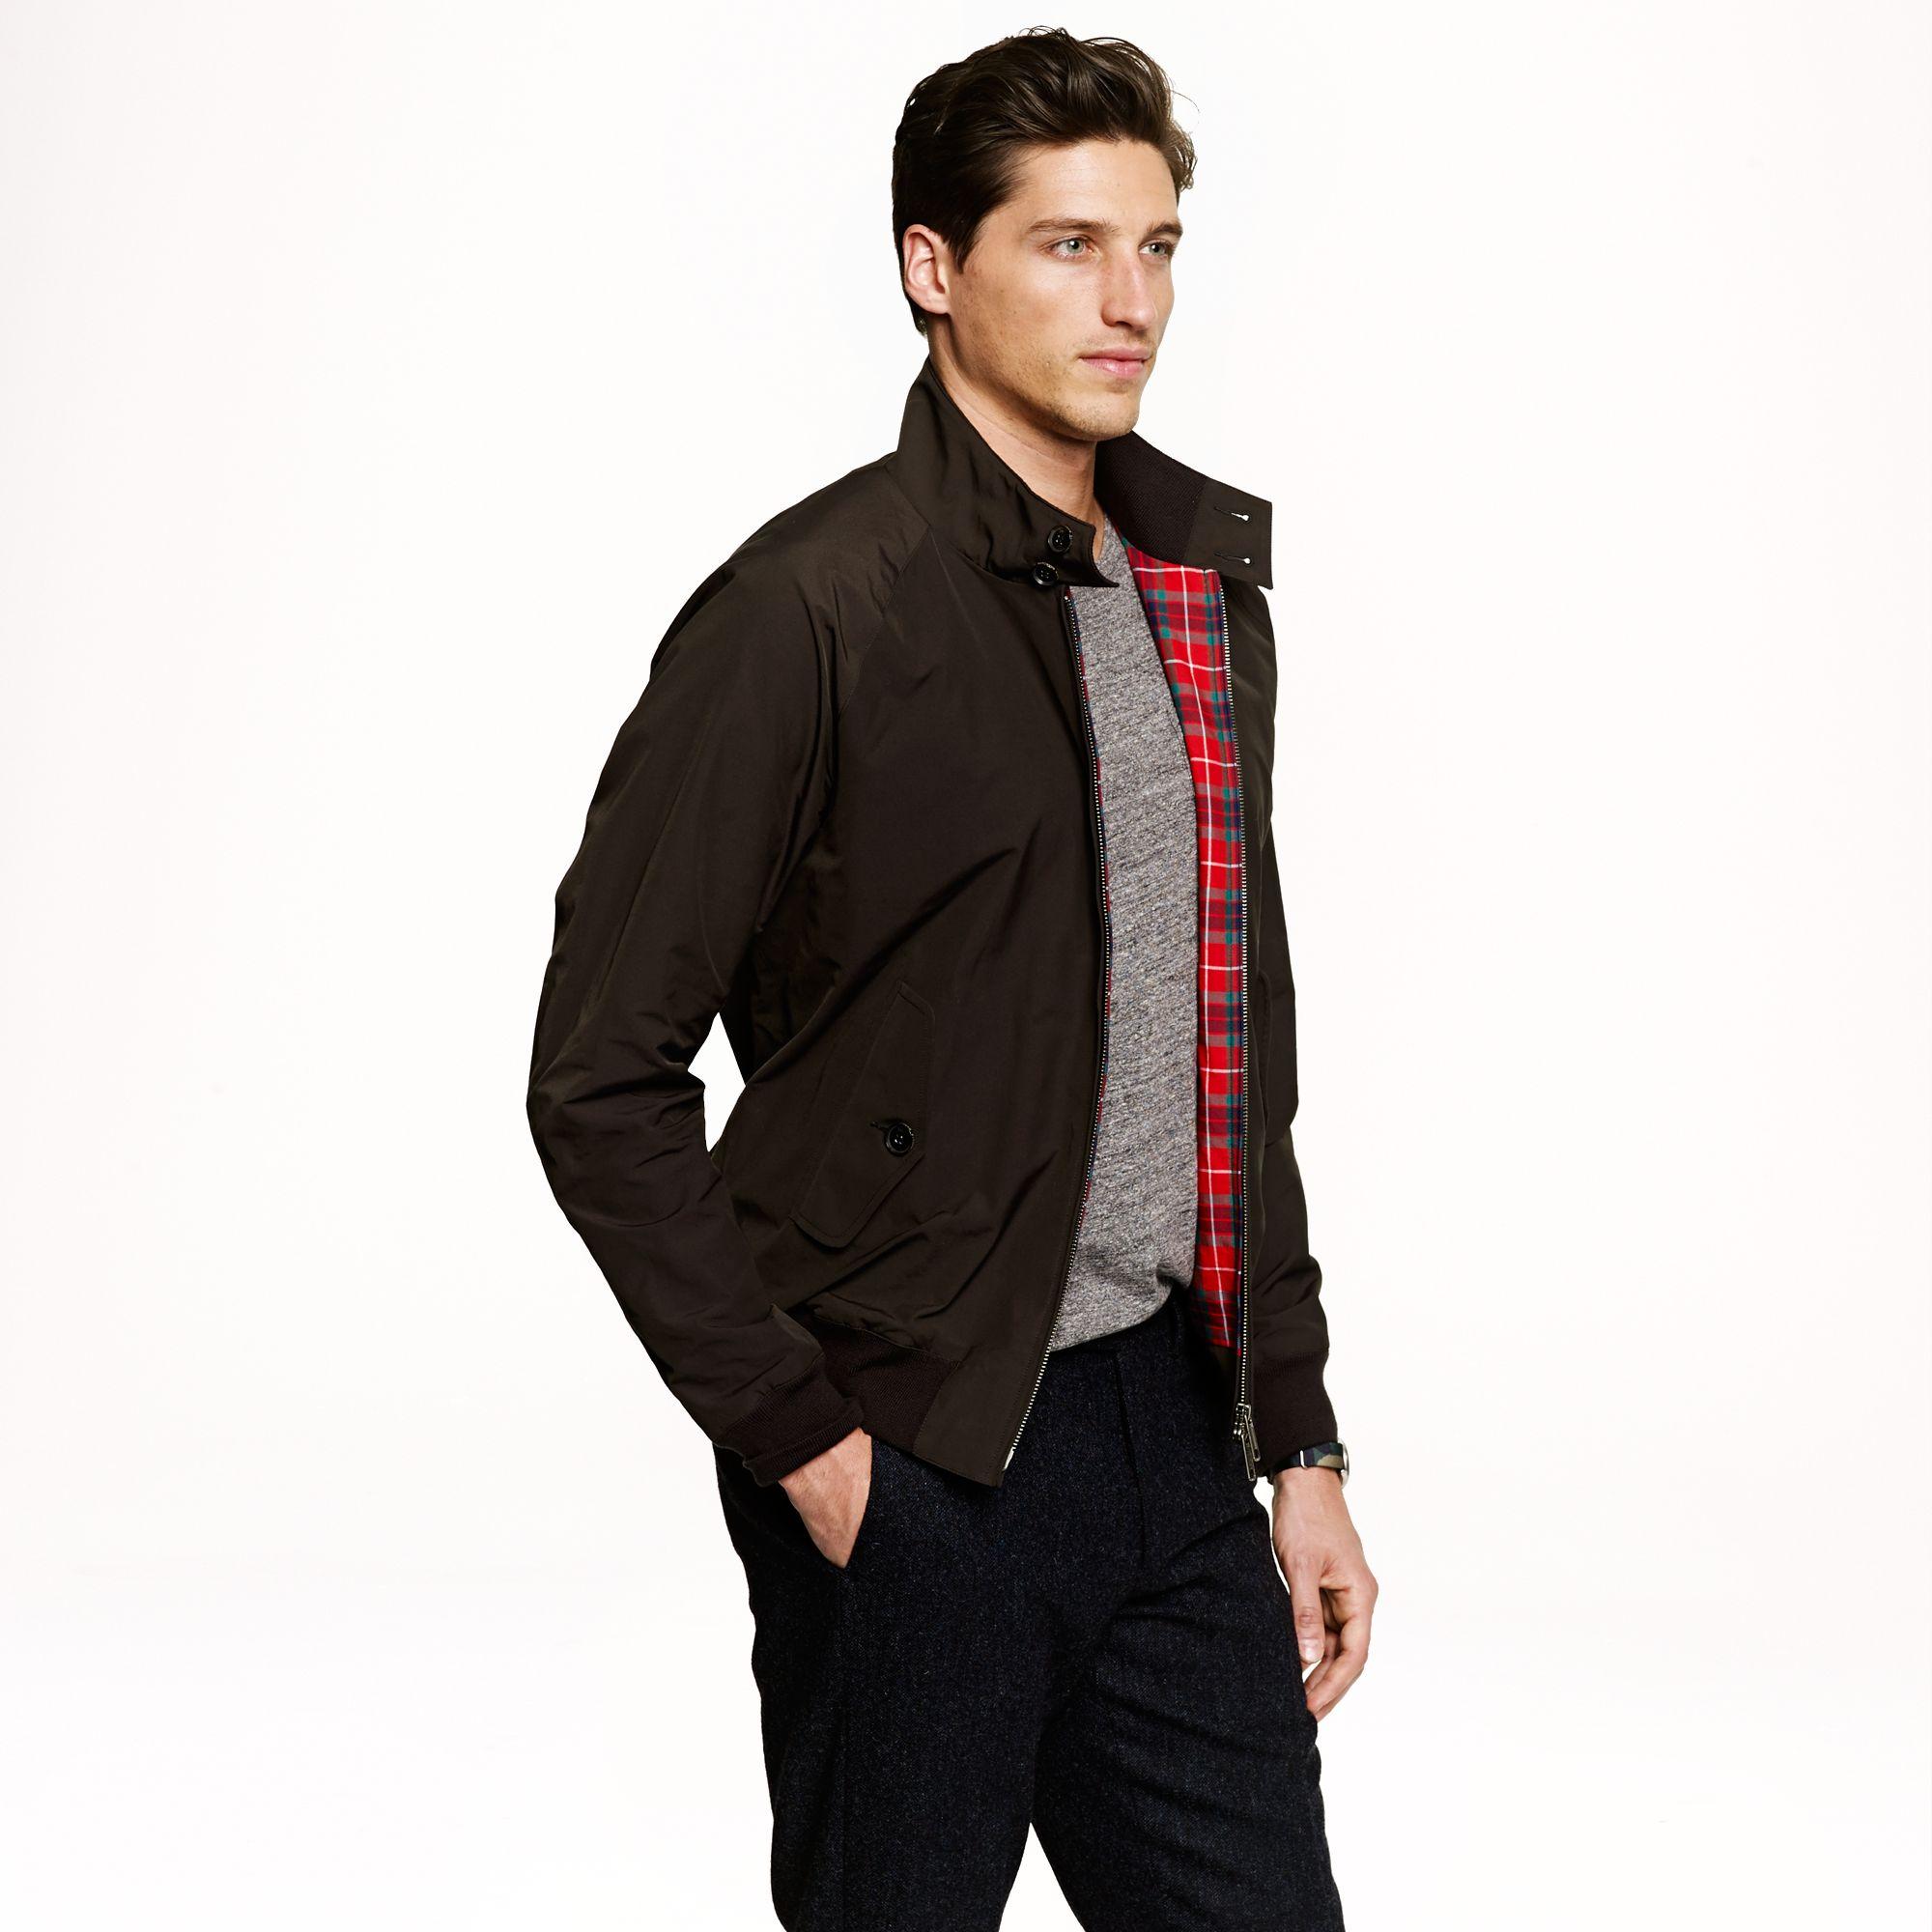 J Crew Baracuta G9 Harrington Jacket In Black For Men